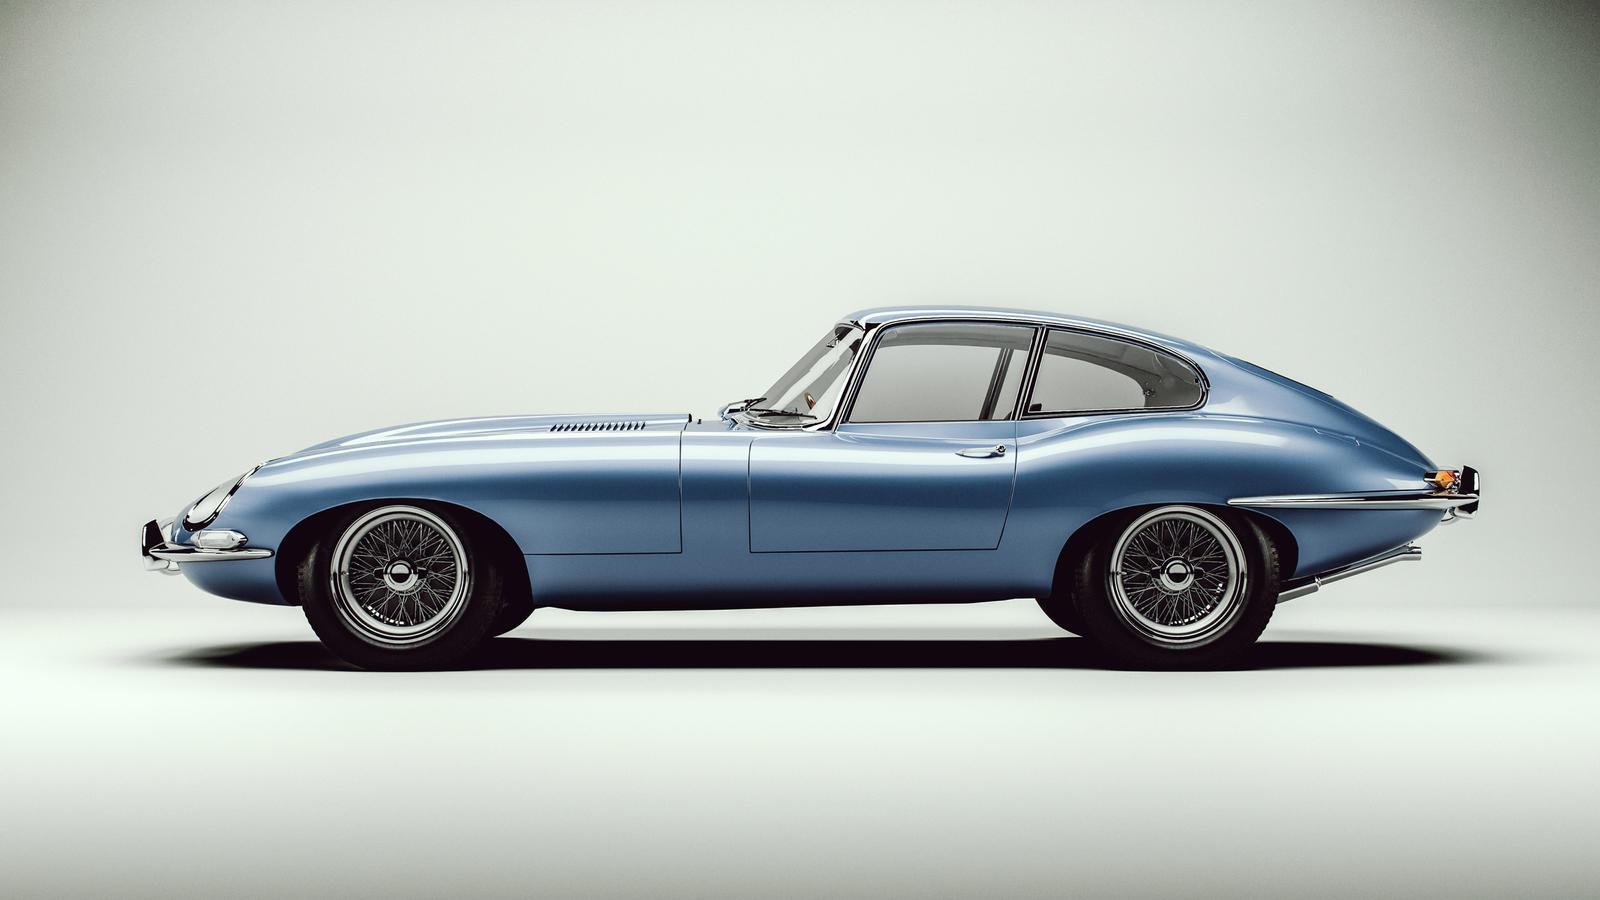 Jaguar XKE (E-type) by Laffonte